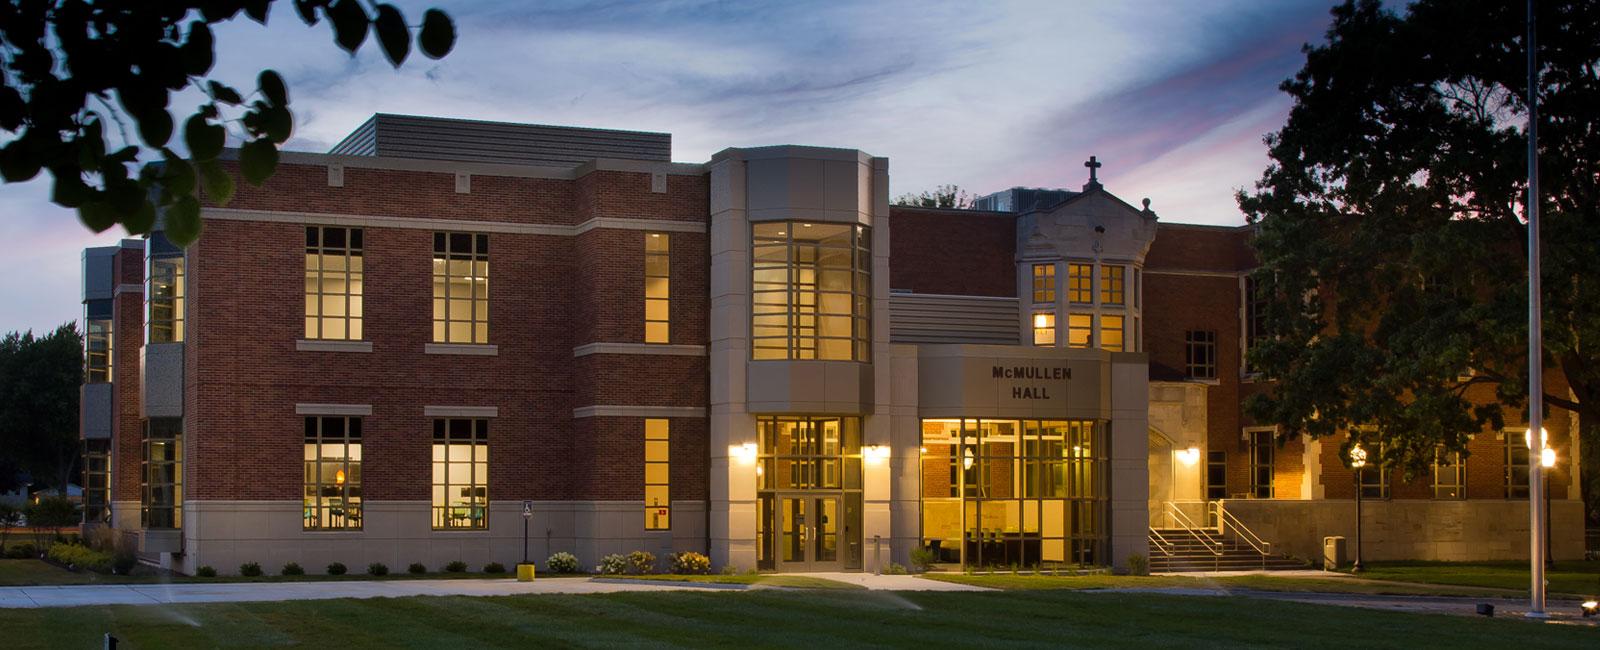 St. Ambrose University - McMullen Hall